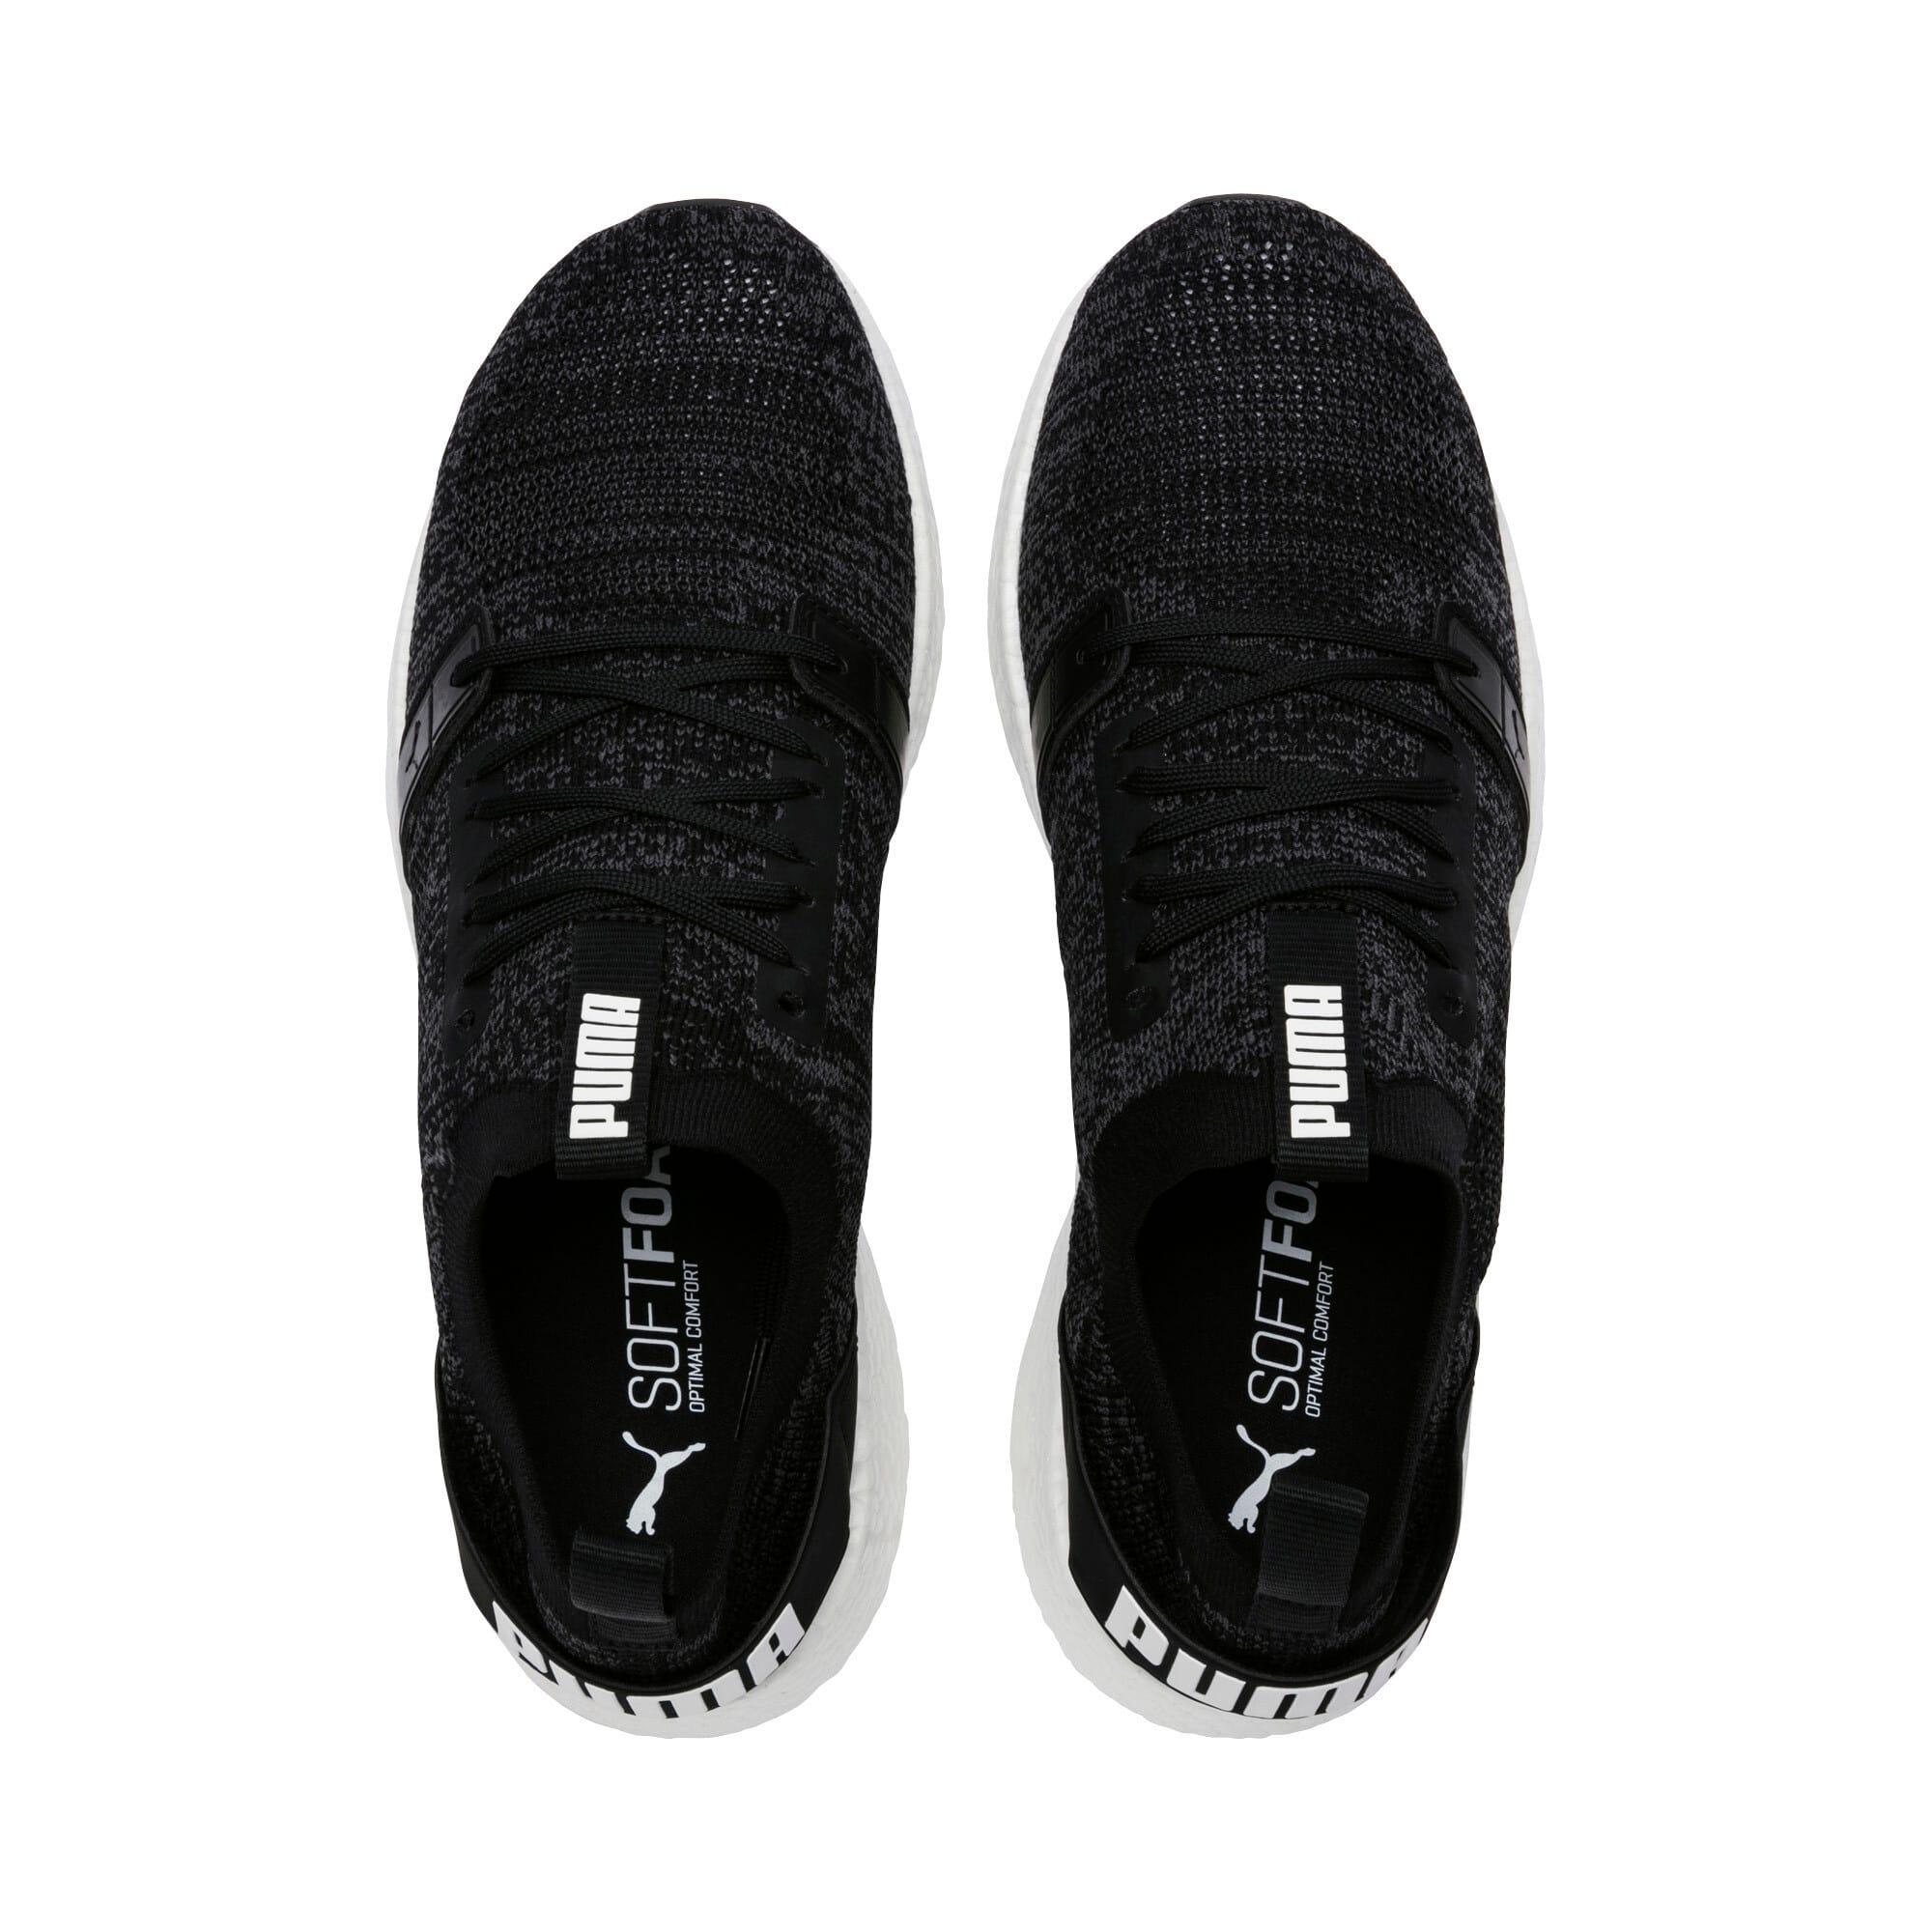 Thumbnail 6 of NRGY Neko Engineer Knit Men's Running Shoes, Puma Black-Iron Gate, medium